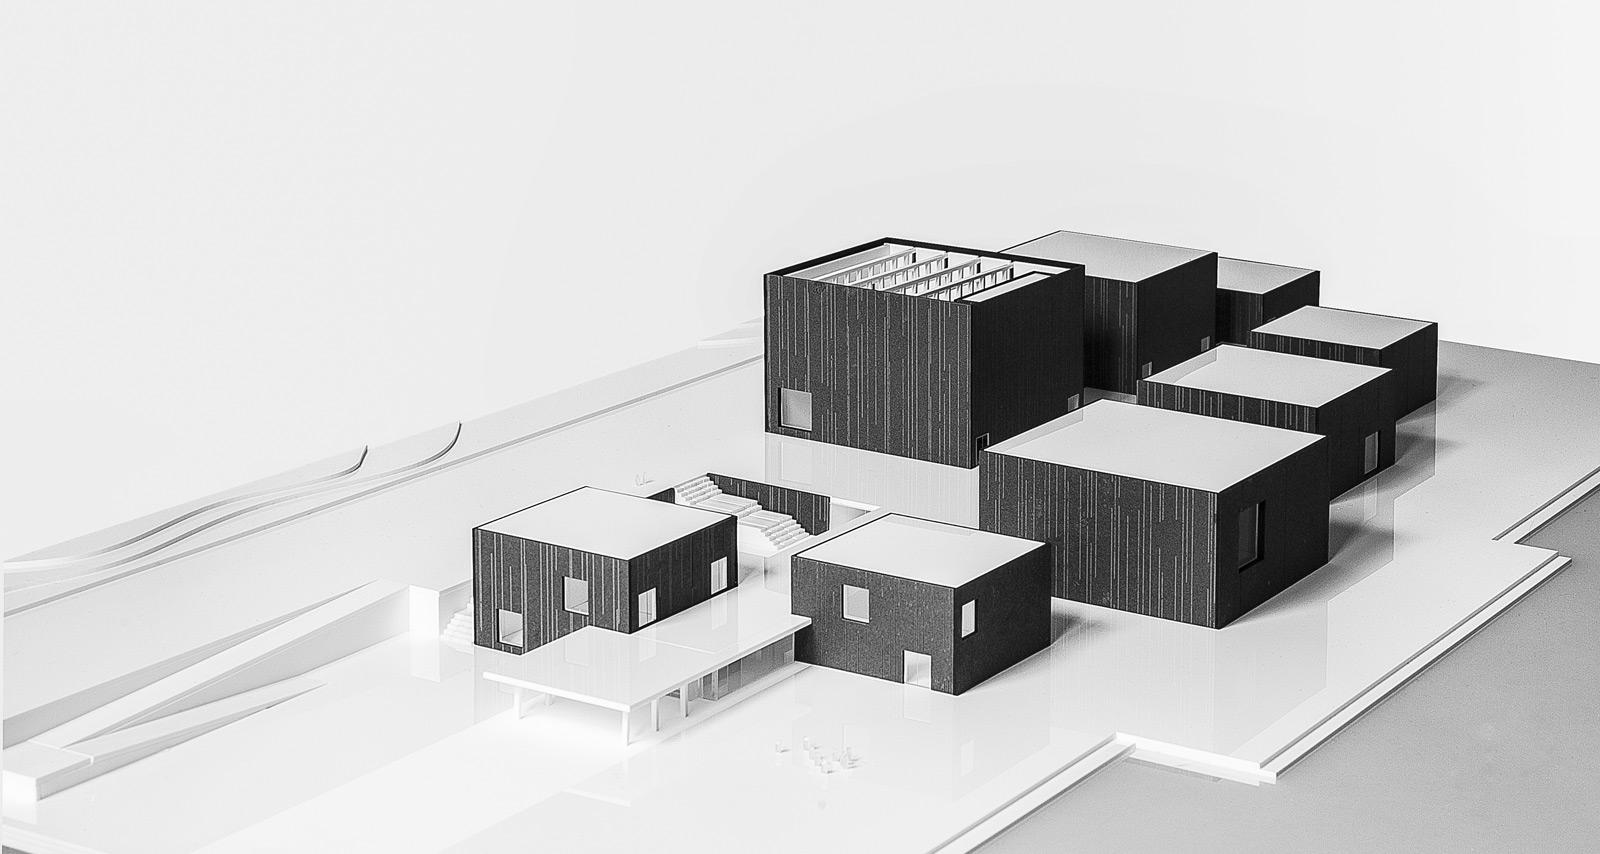 maqueta-arquitectura-valencia-arquiayuda-arquimaqueta-museo-fluvial-en-oporto-architecture-model (1)